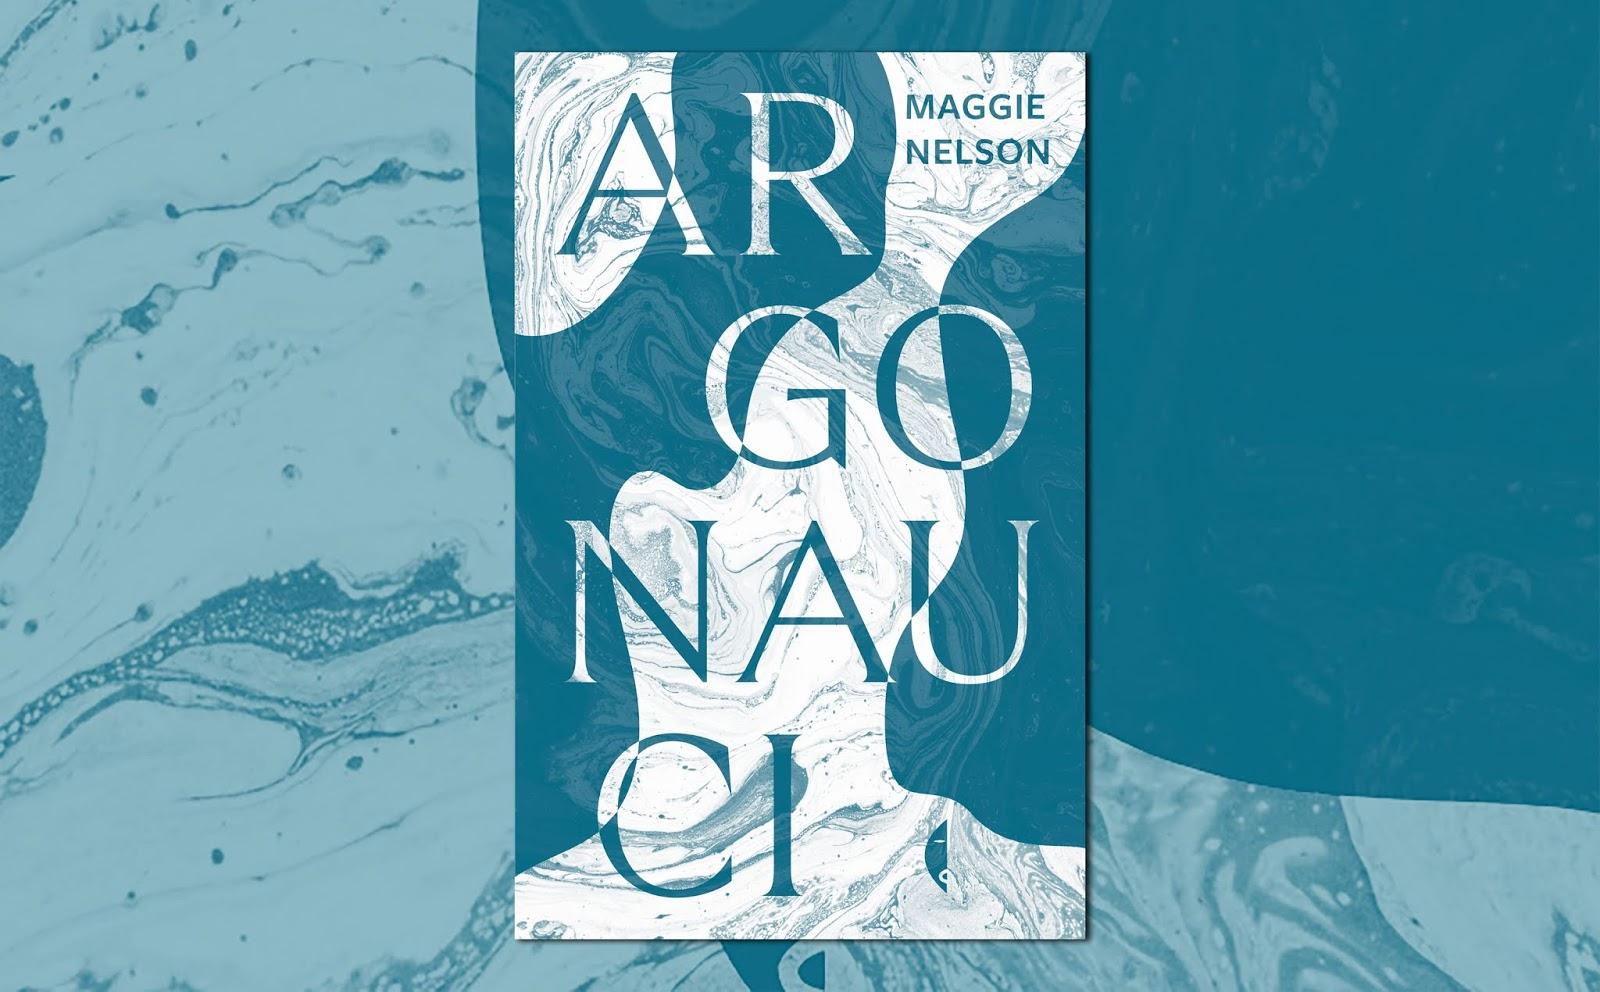 argonauci, maggie nelson, wydawnictwo czarne, queer, lgbtq